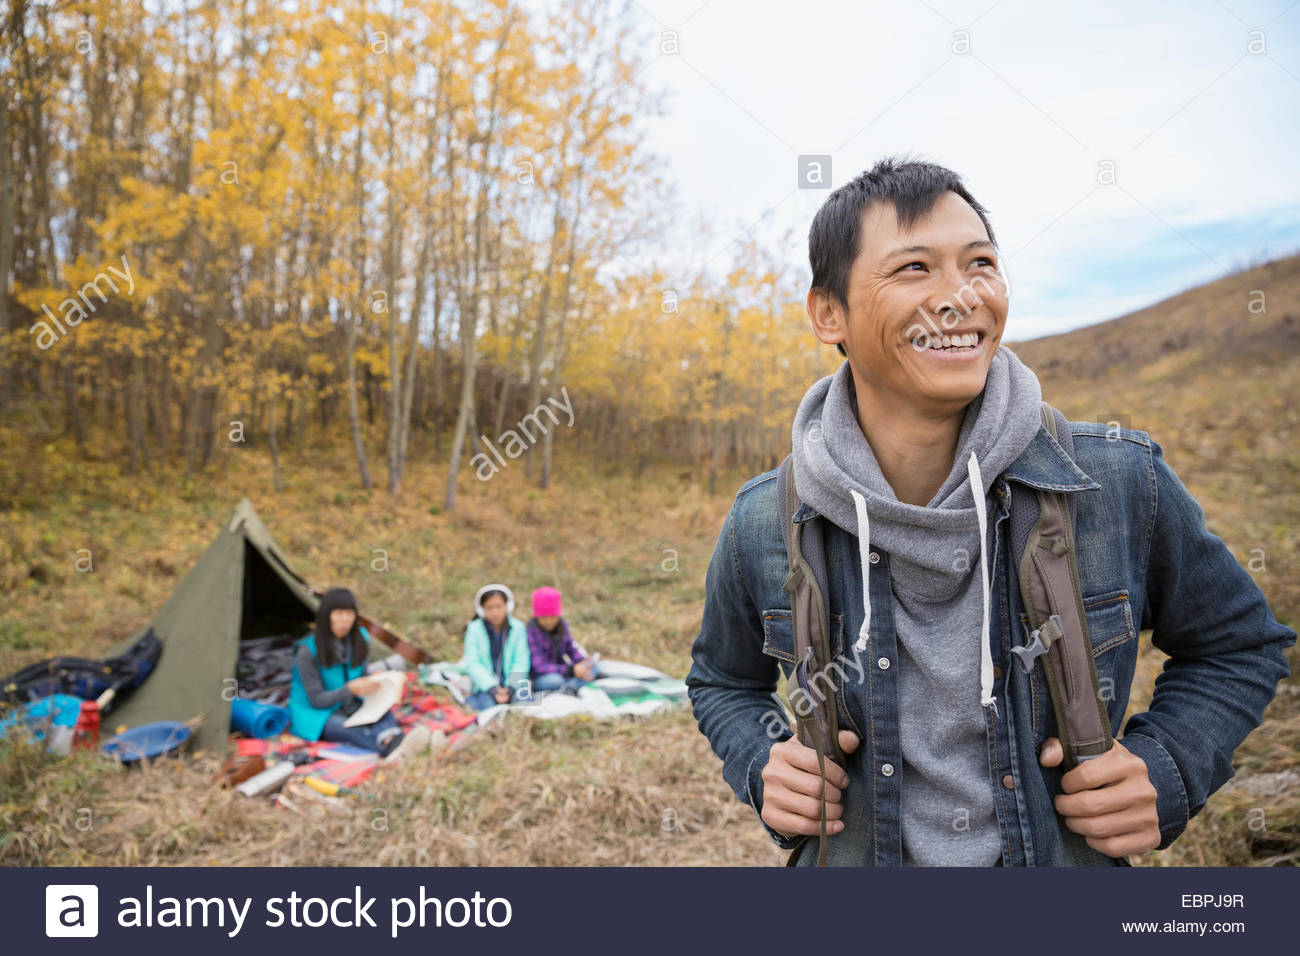 Lächelnder Mann mit Familie camping Stockbild